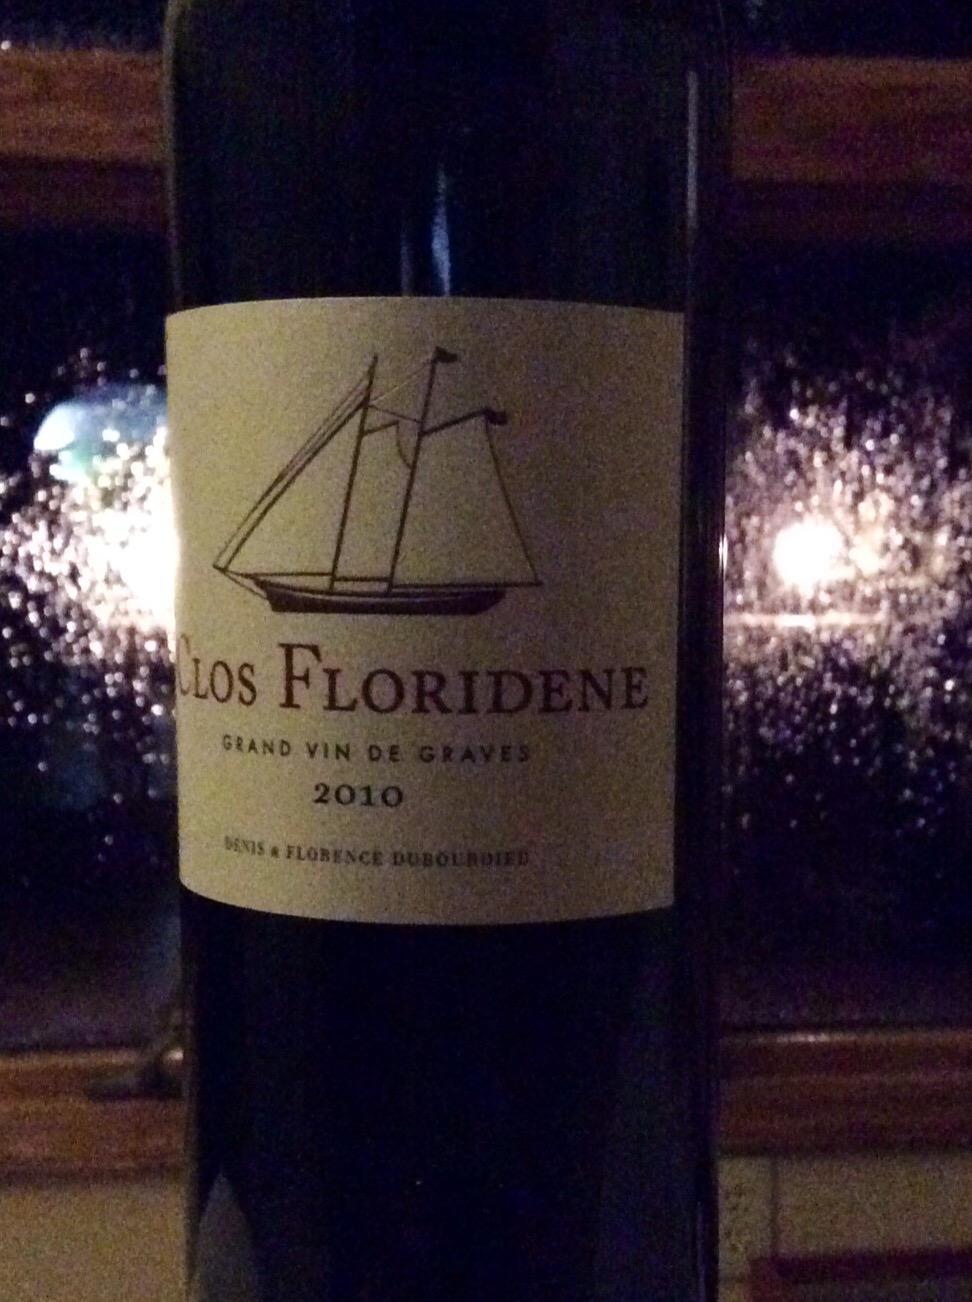 2010 Clos Floridene Grand Vin de Graves France